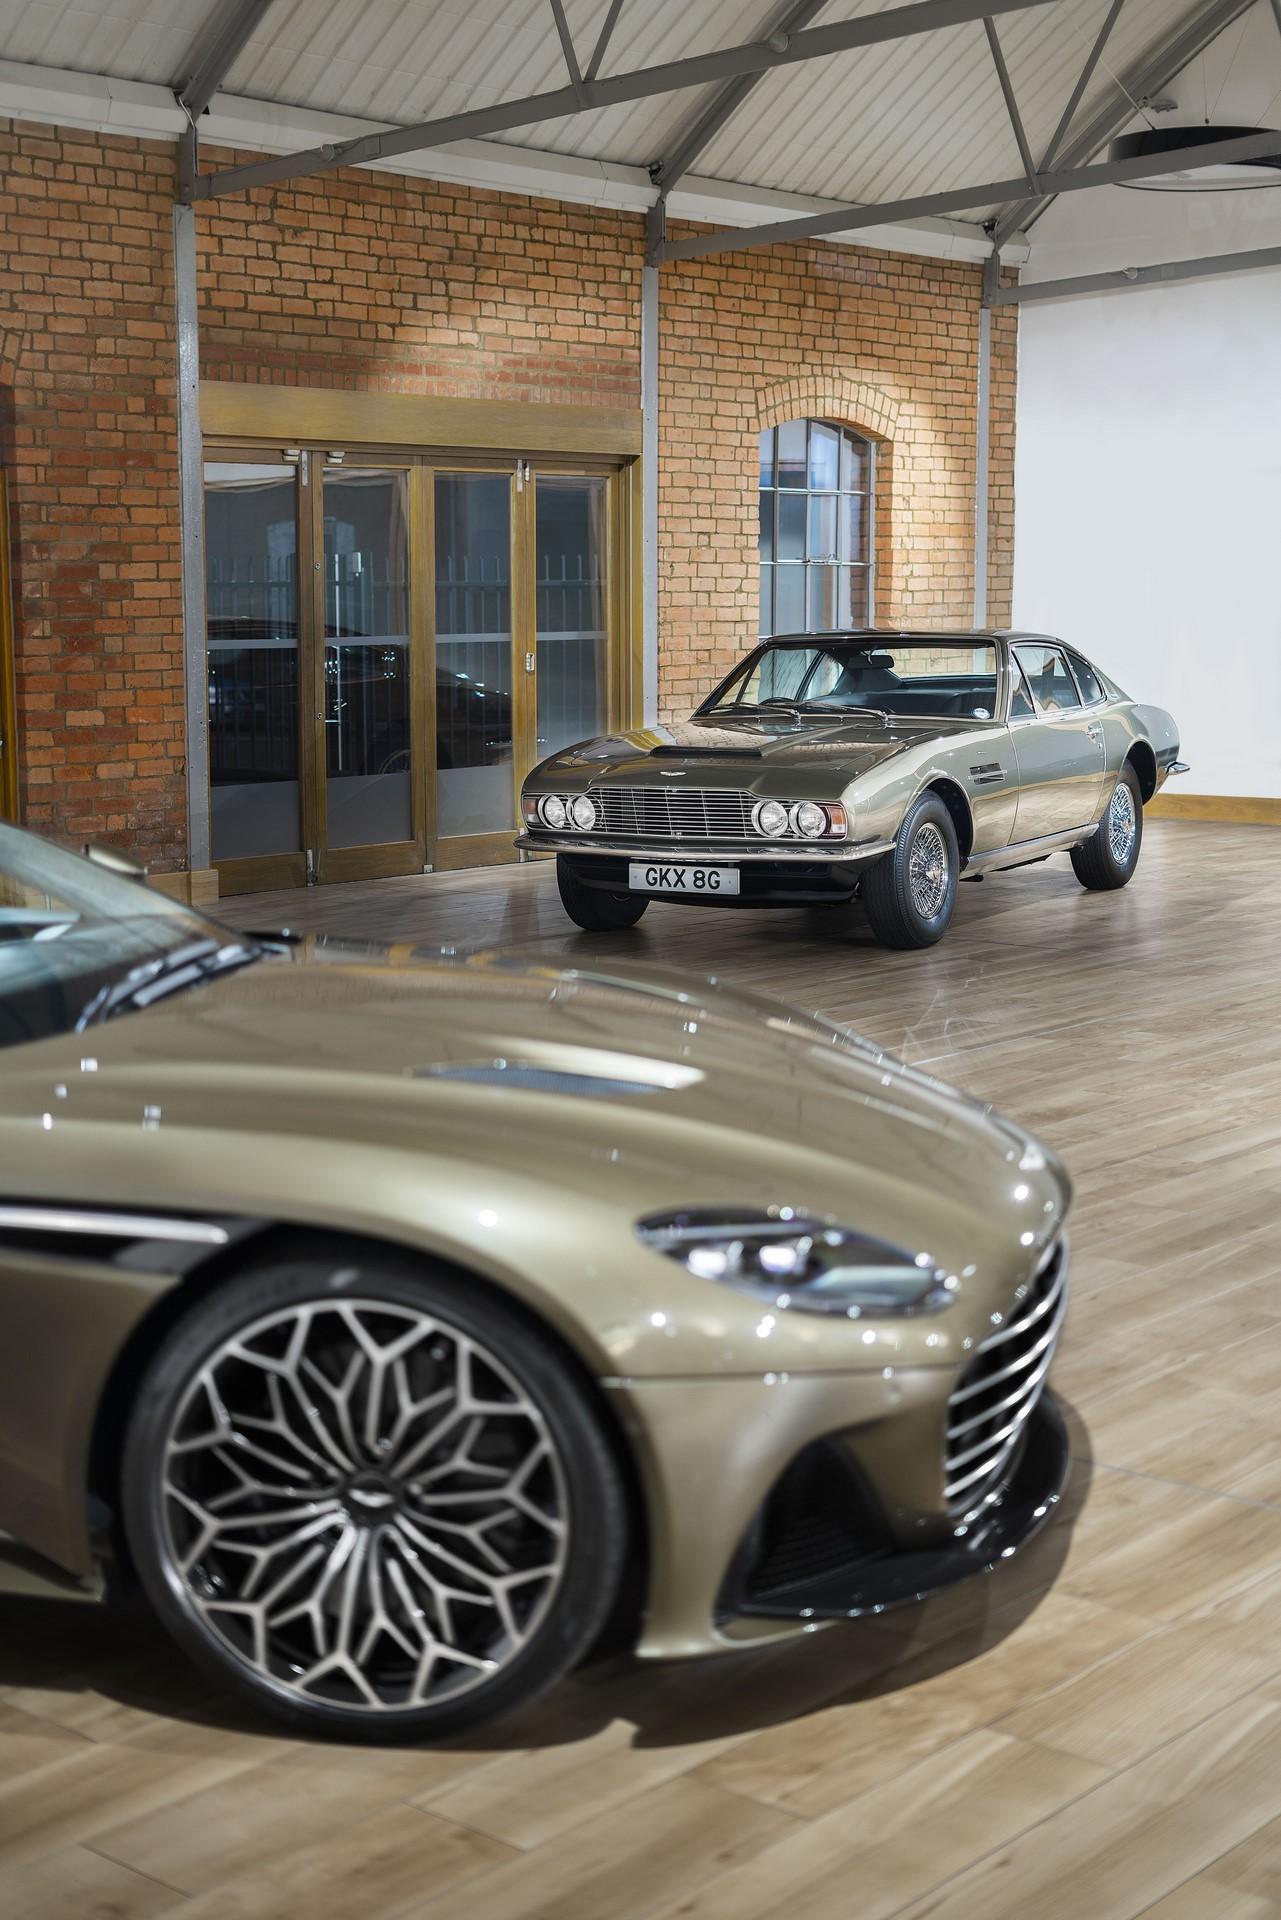 Aston-Martin-DBS-Superleggera-James-Bond-Special-Edition-9